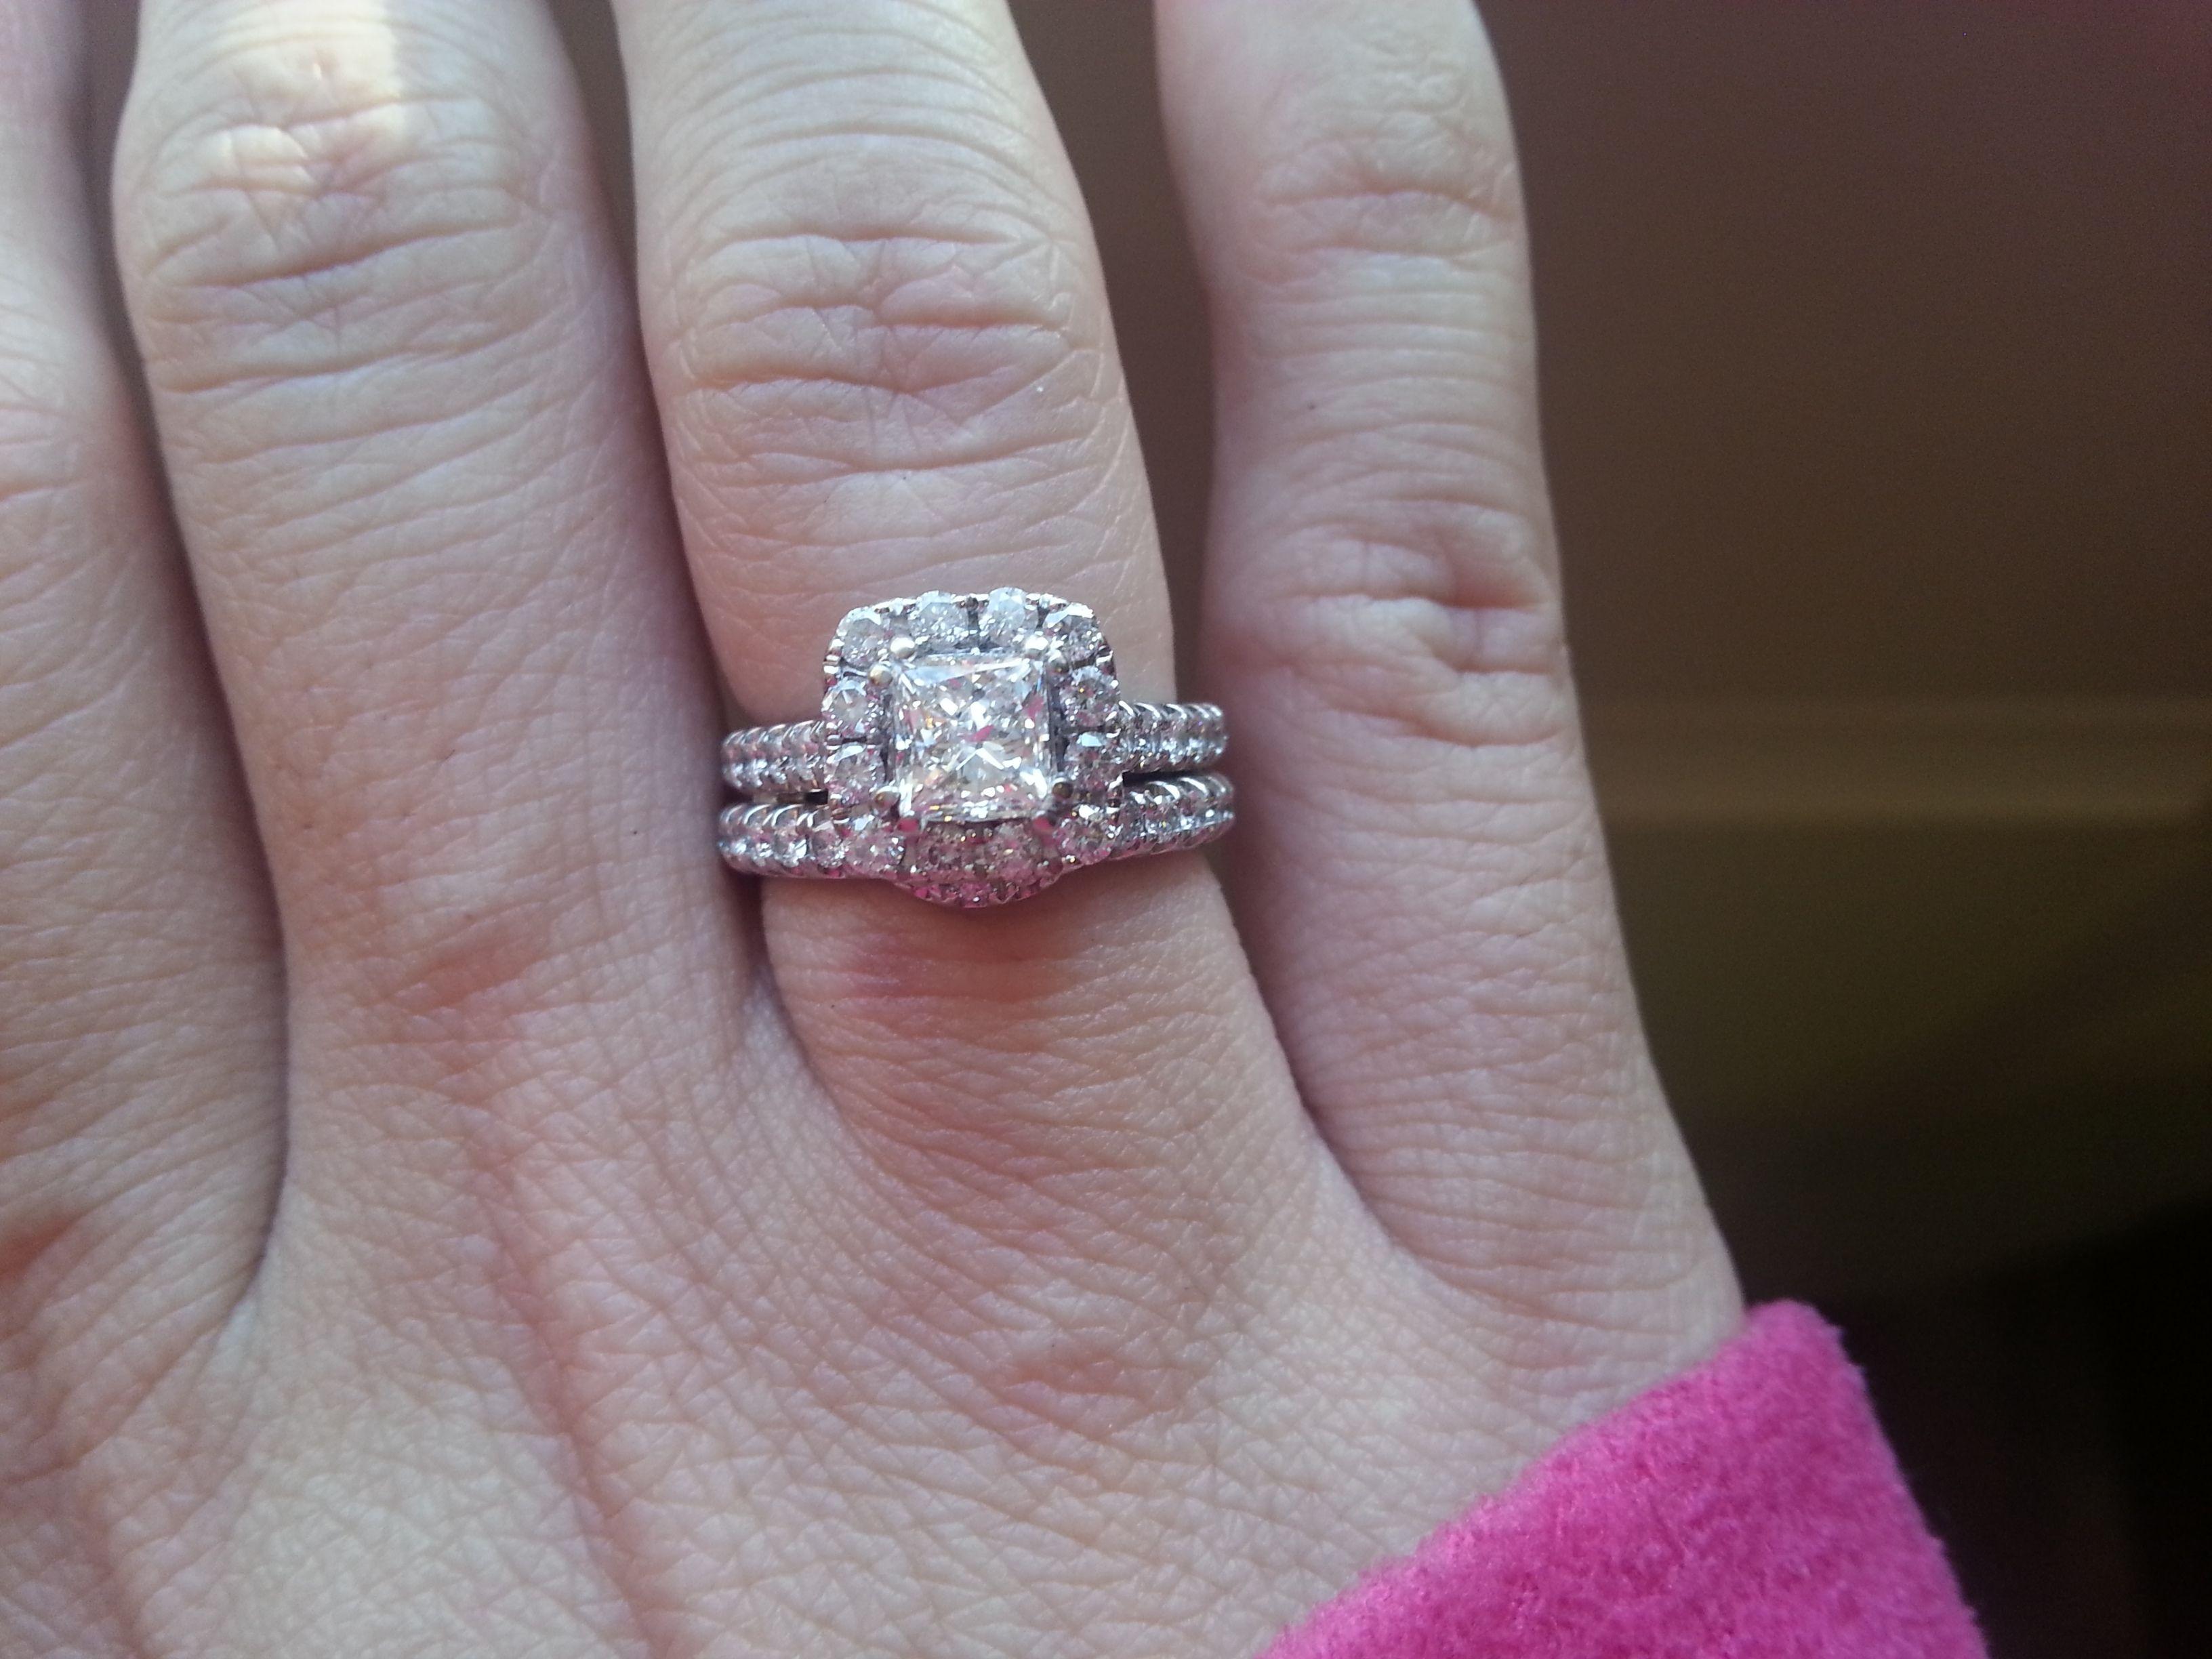 Half Carat Diamond Ring Value Ring Pinterest Diamond and Ring